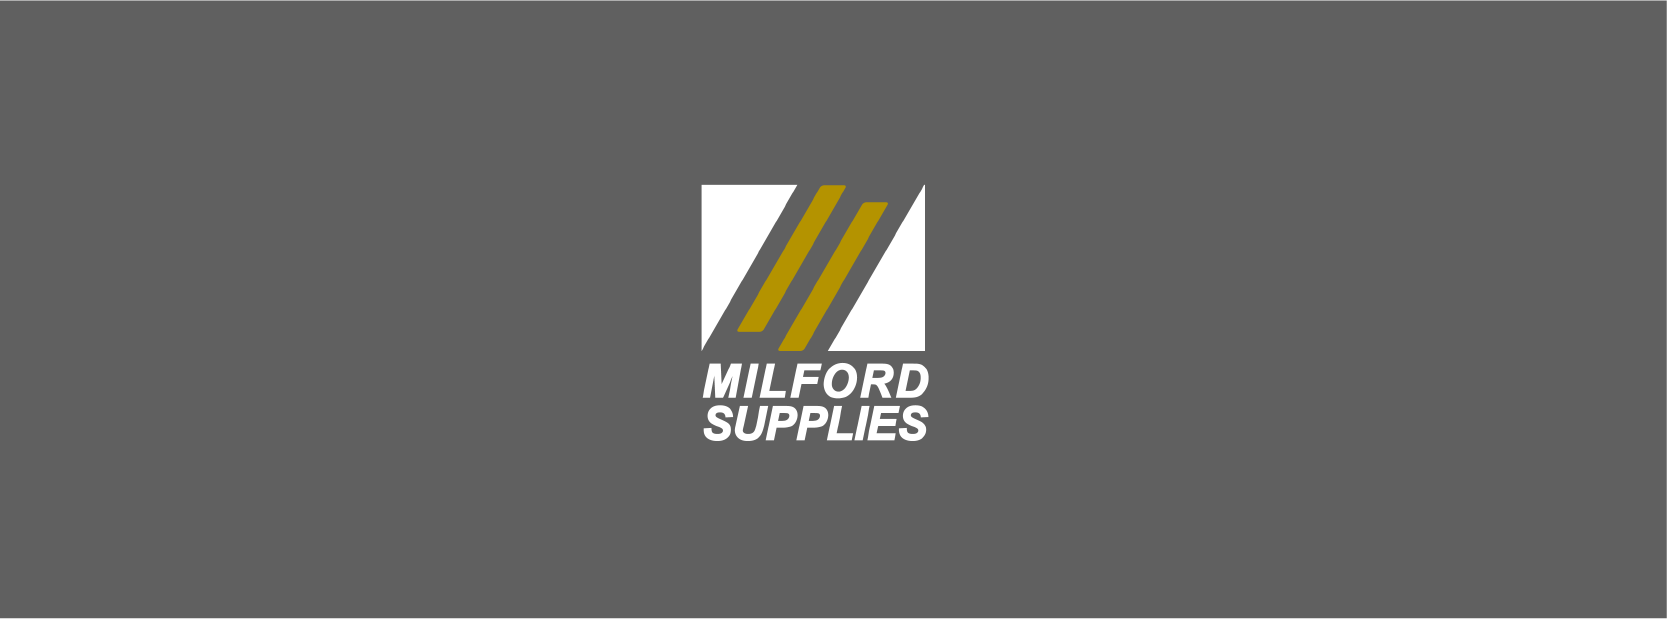 Hardware store logo